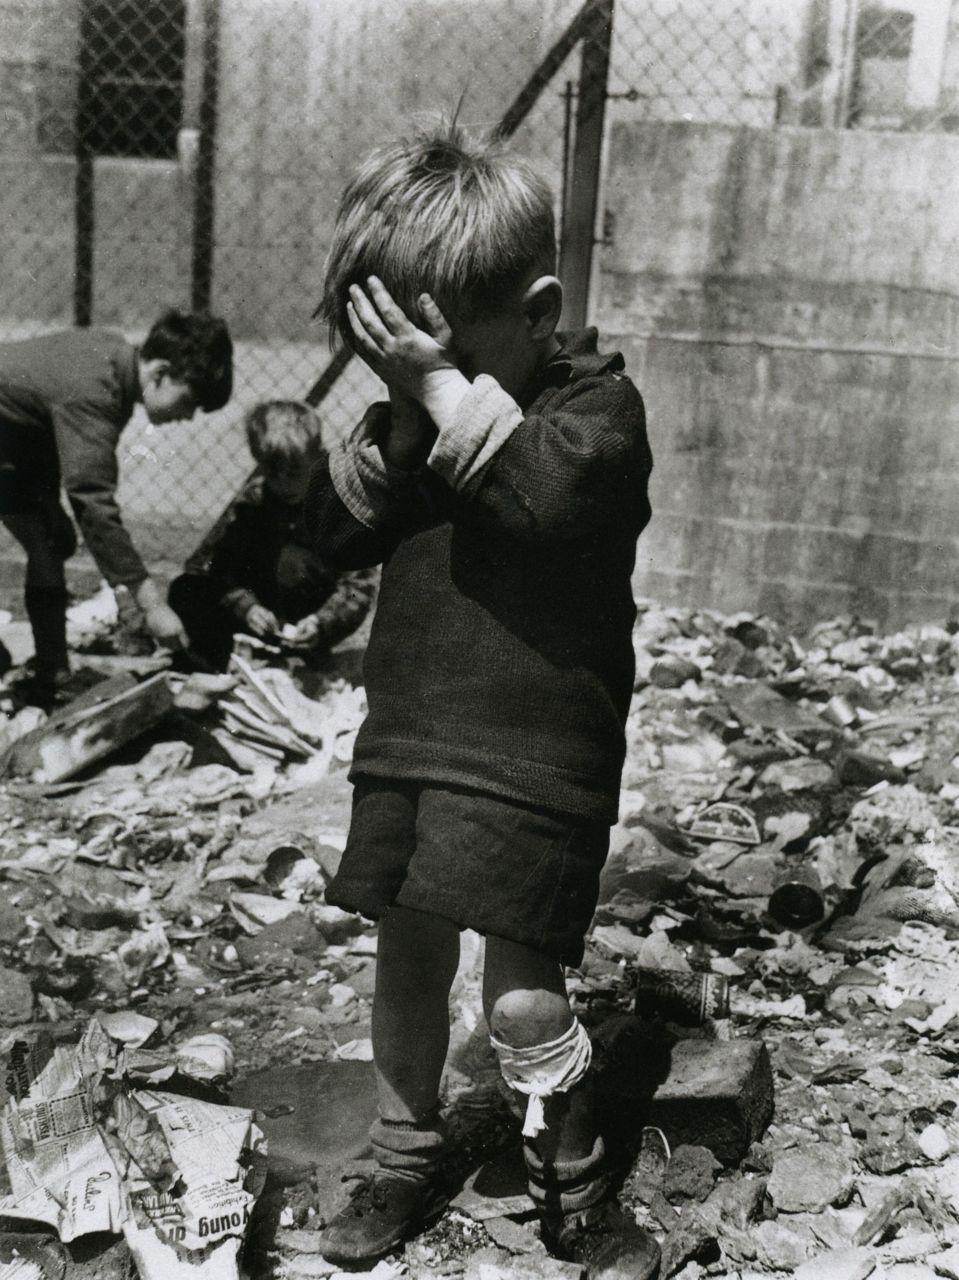 1957. Мальчик на развалинах, Уэверли Уолк, Харроу-роуд